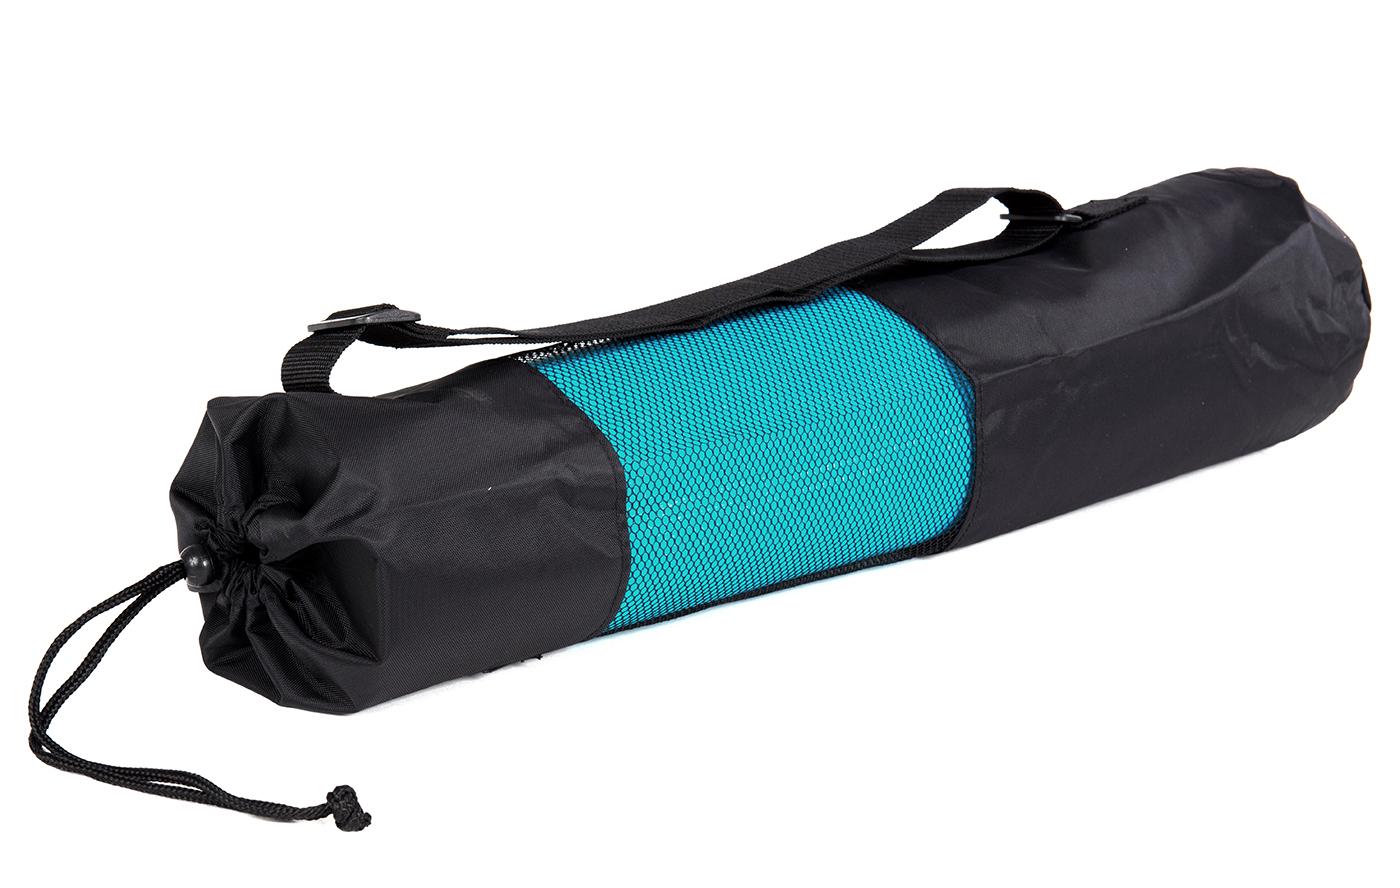 Yogatasche basic - nylon net - 65 cm